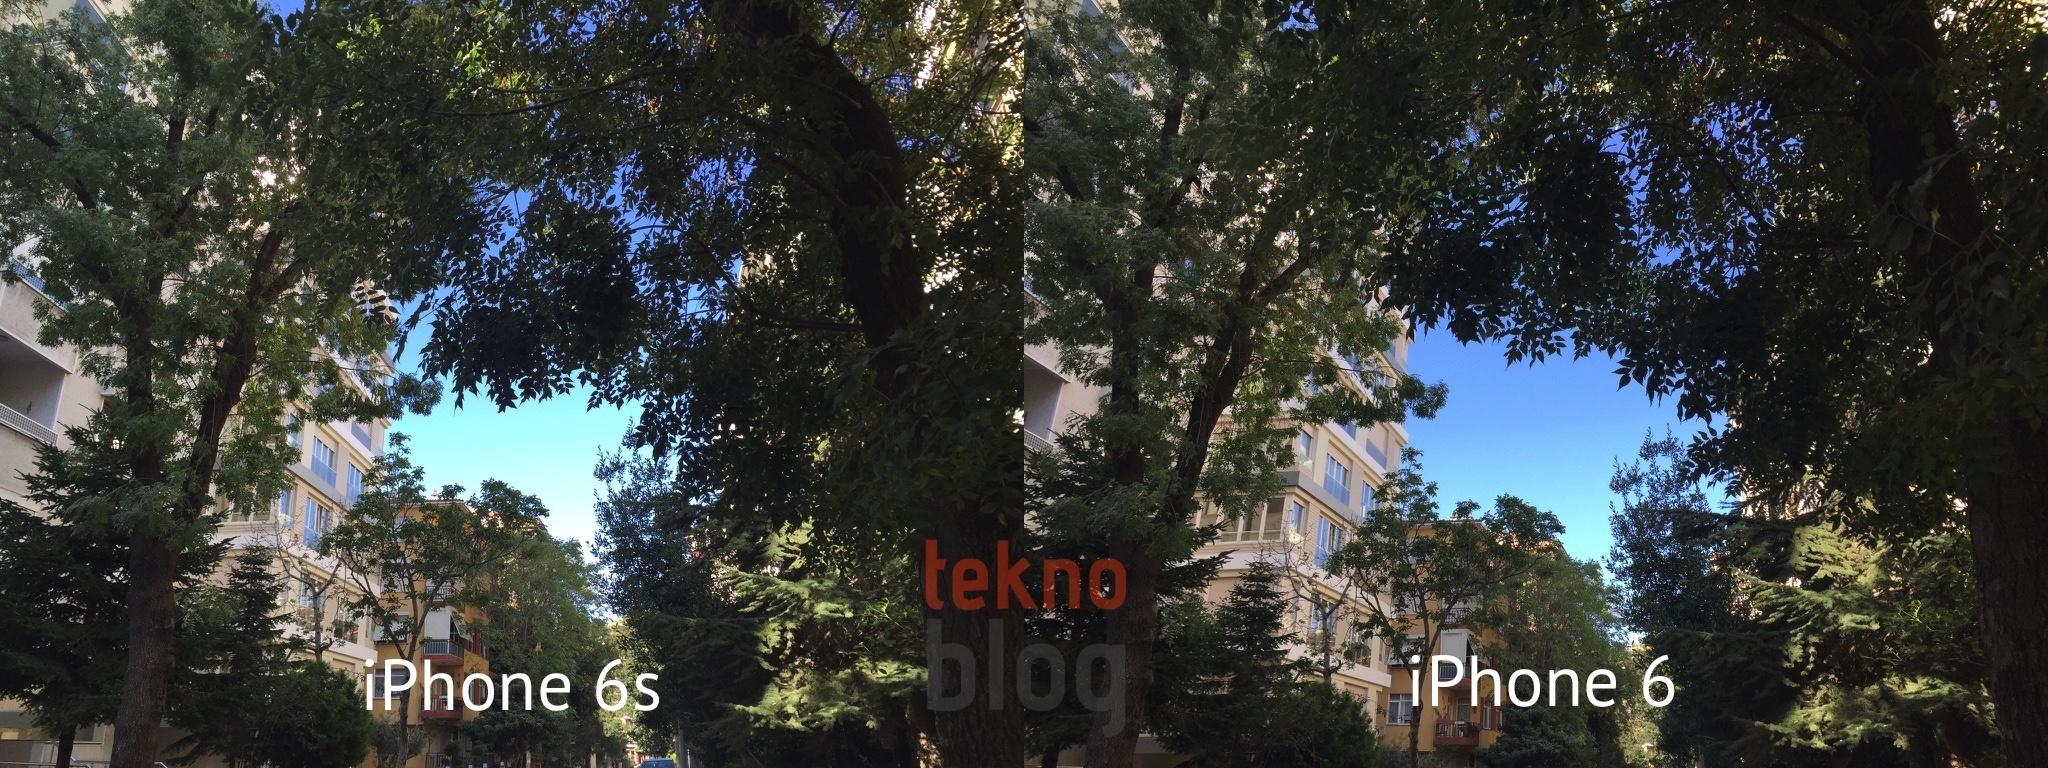 iphone-6s-vs-iphone-6-fotograf-inceleme-121015